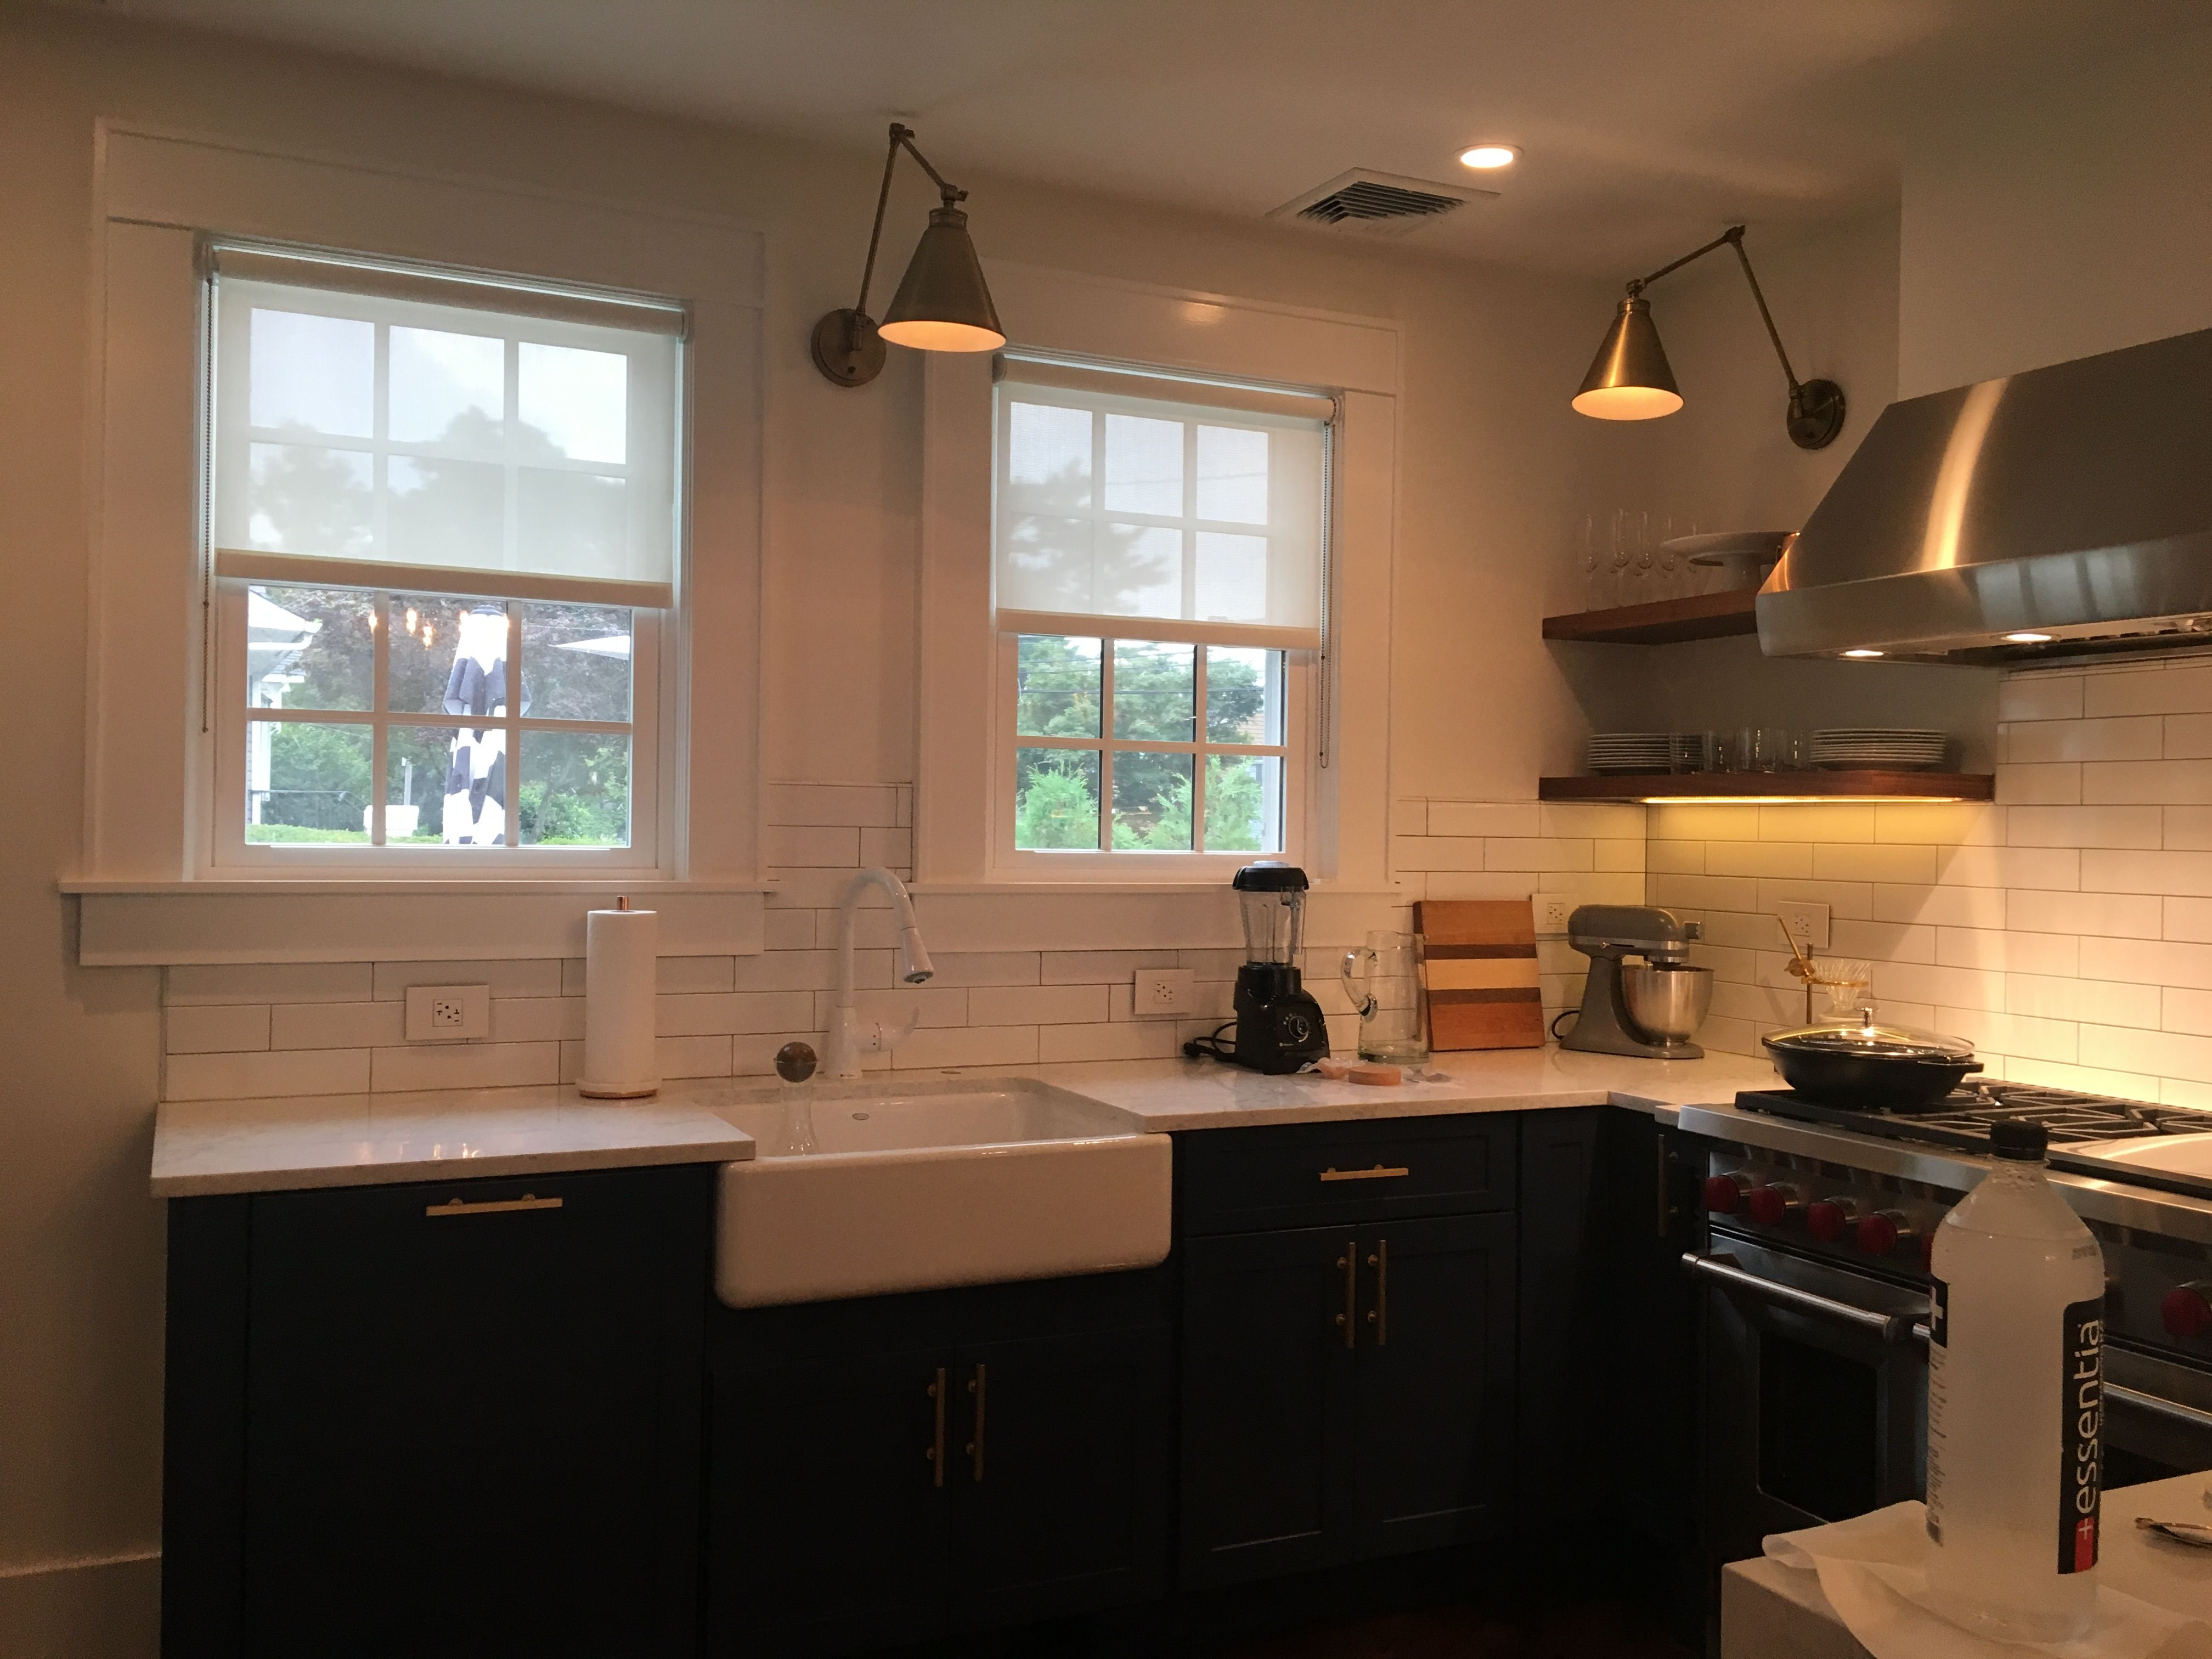 Pin by lori pineo on justinus kitchen u bathroom renovation